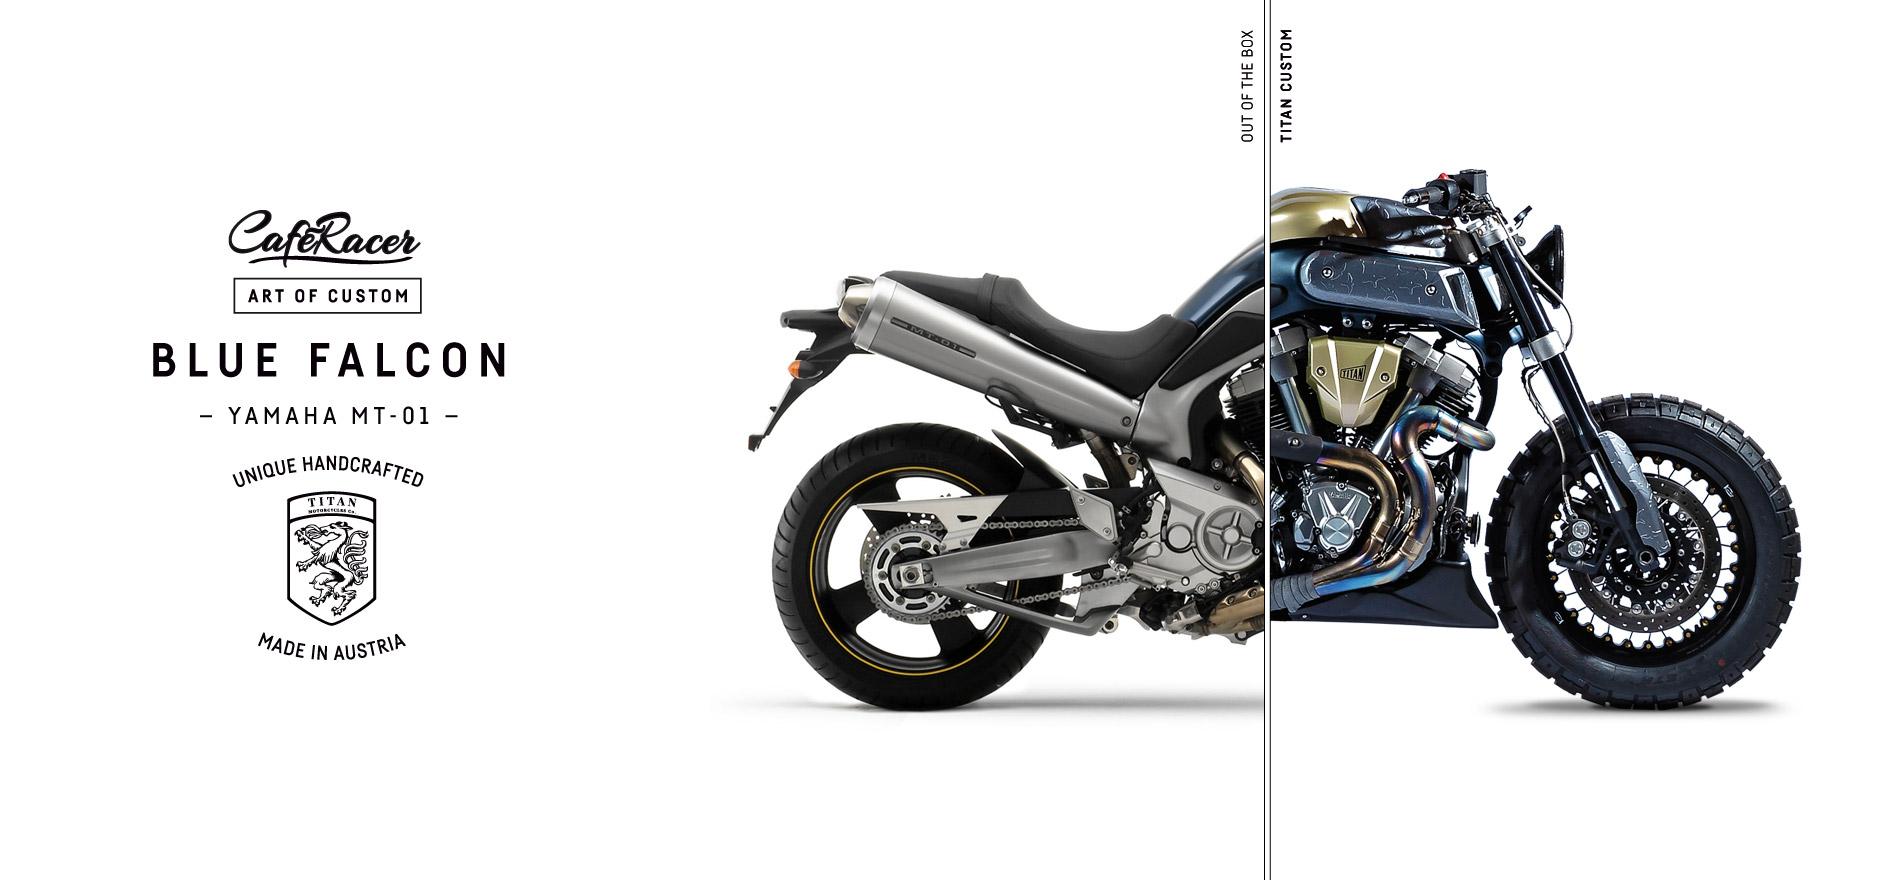 TITAN_CustomBike_CafeRacer_Graz_MadeInAustria_Before-After_Blue-Falcon_Yamaha-MT-01_Motorradumbau_Right